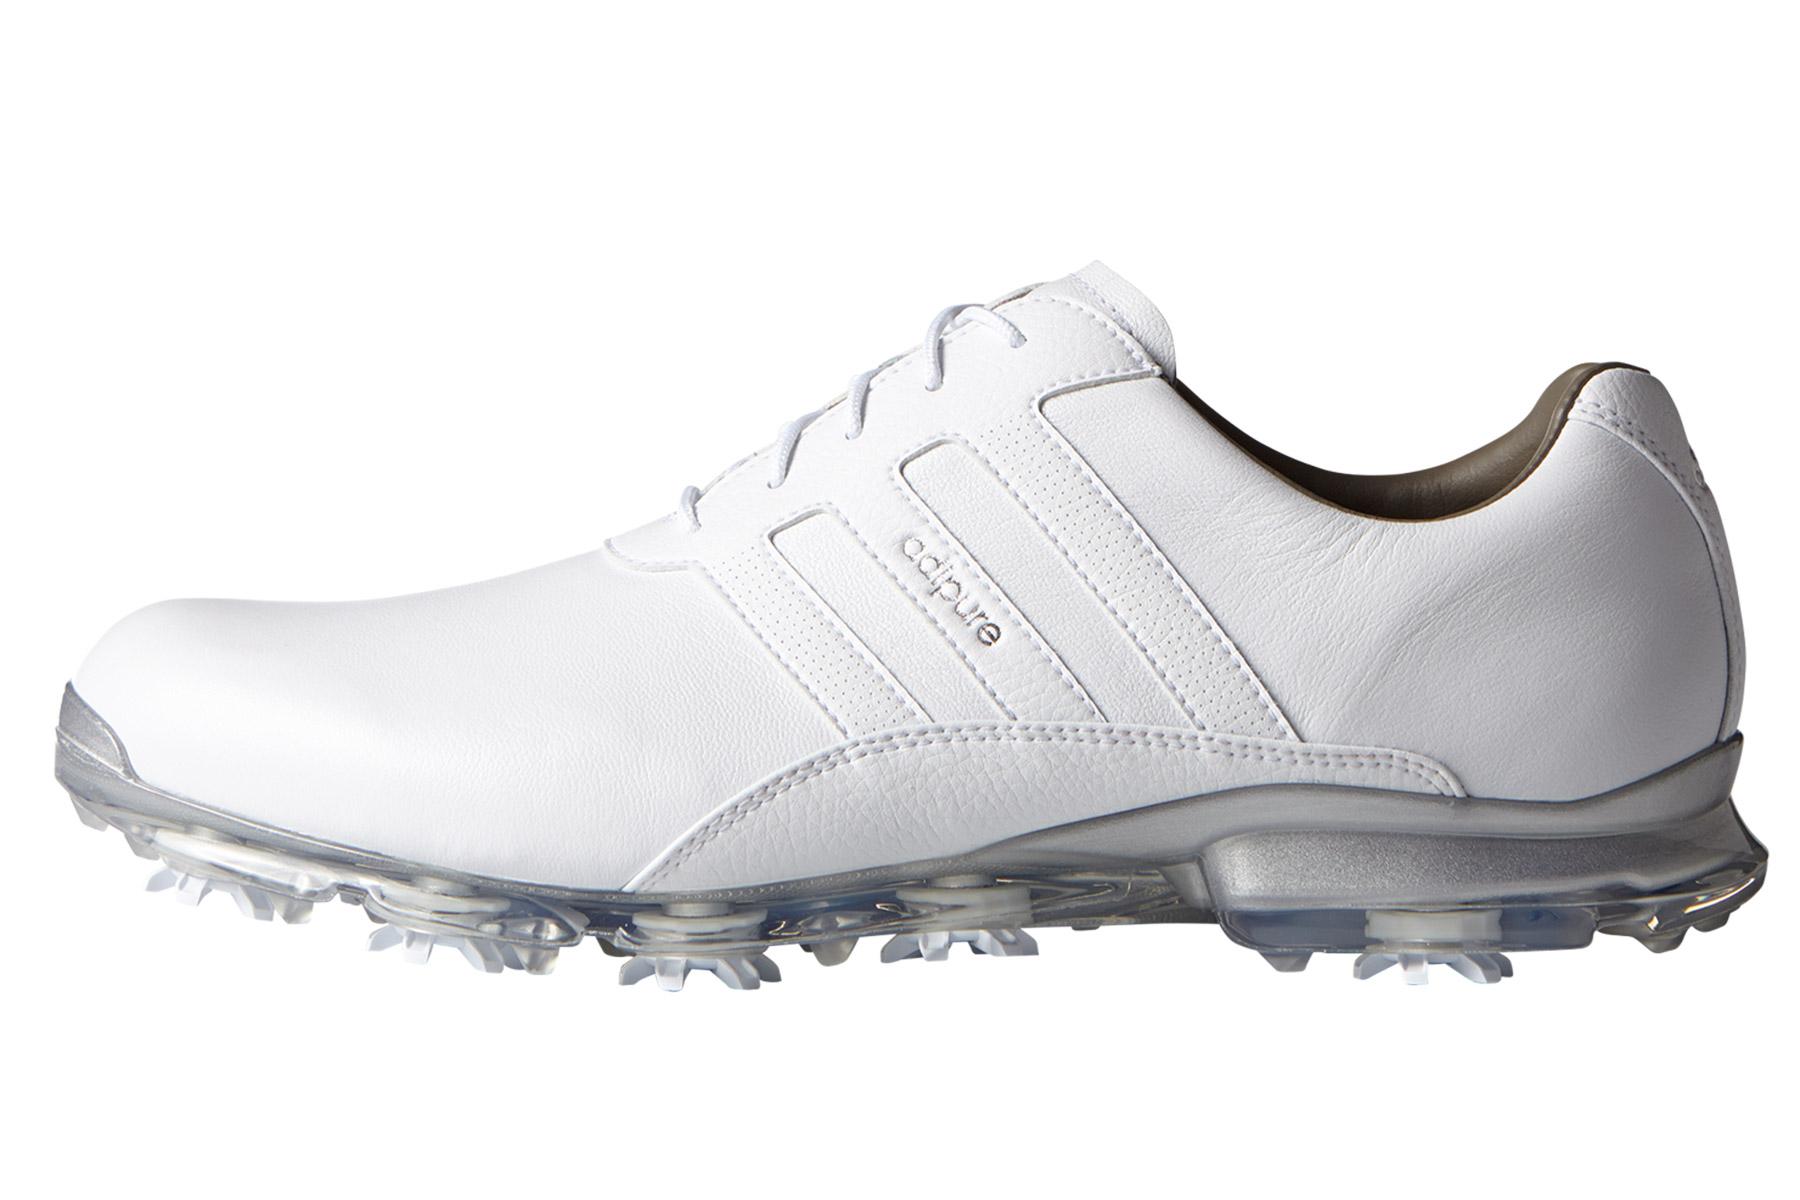 Adipure Classic Golf Shoes